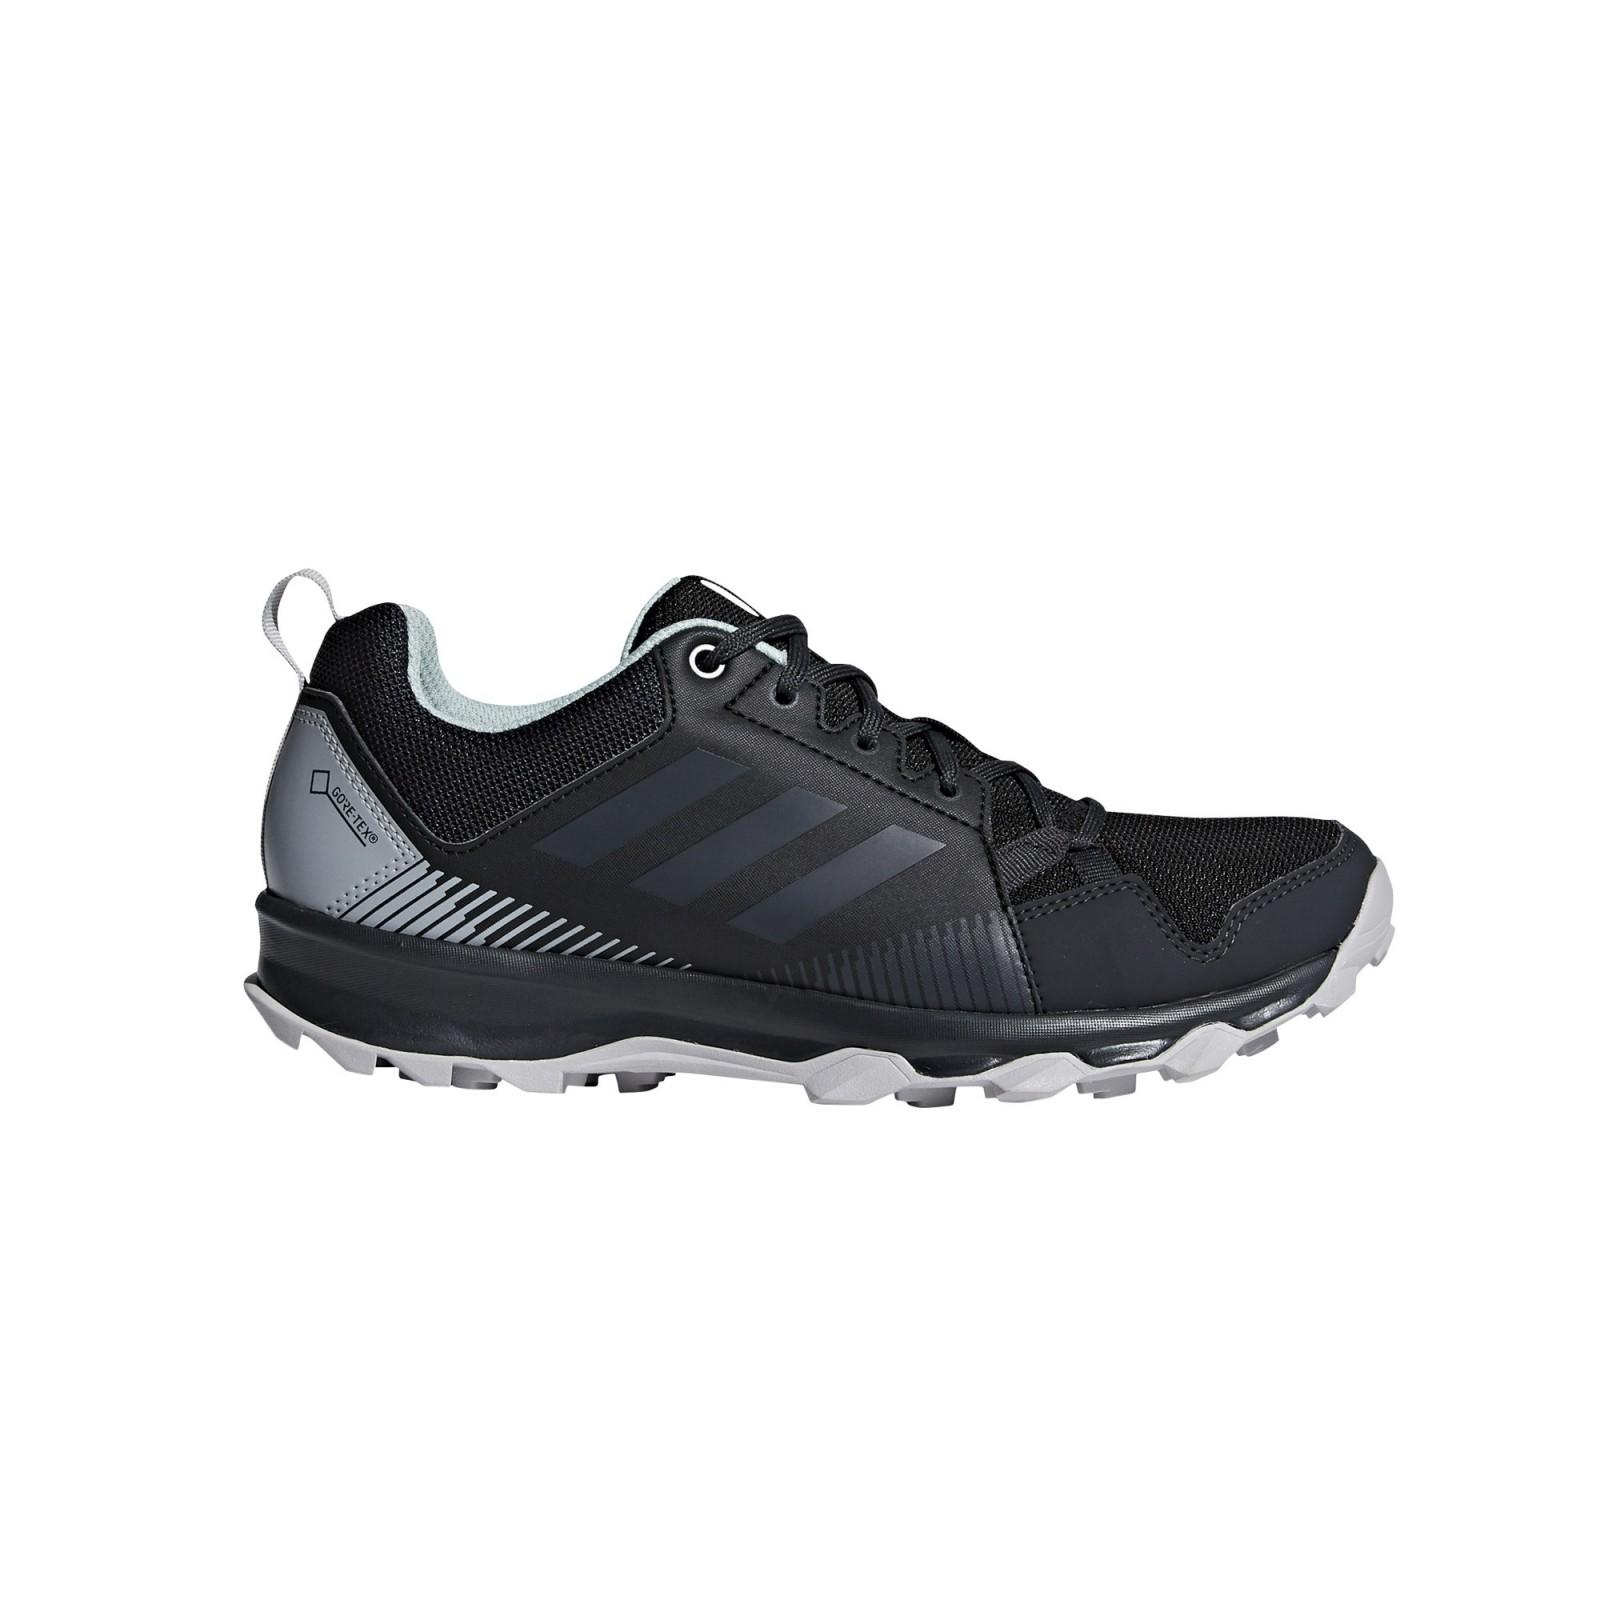 Dámská Treková obuv adidas Performance TERREX TRACEROCKER GTX W  b27941d791e